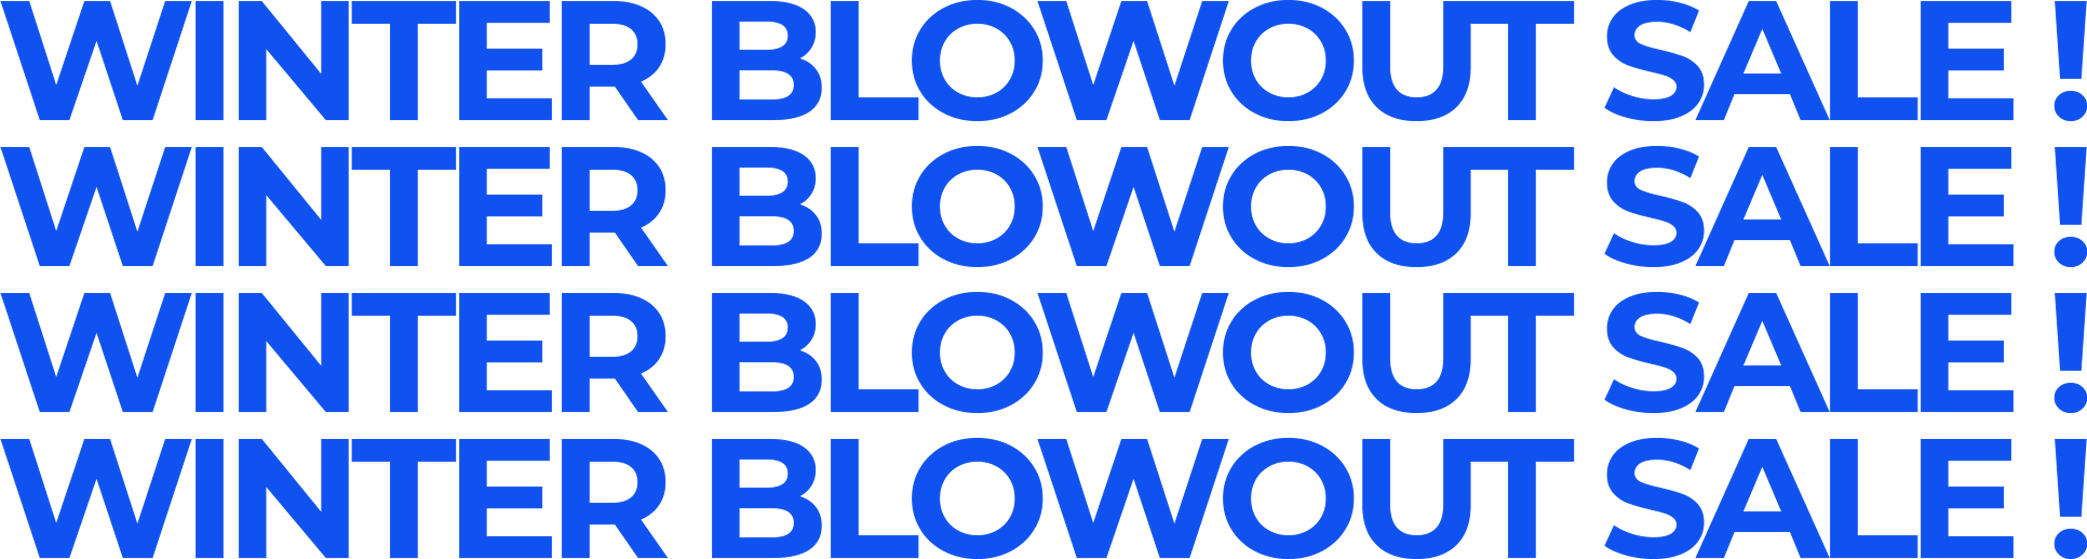 Winter Blowout Sale!